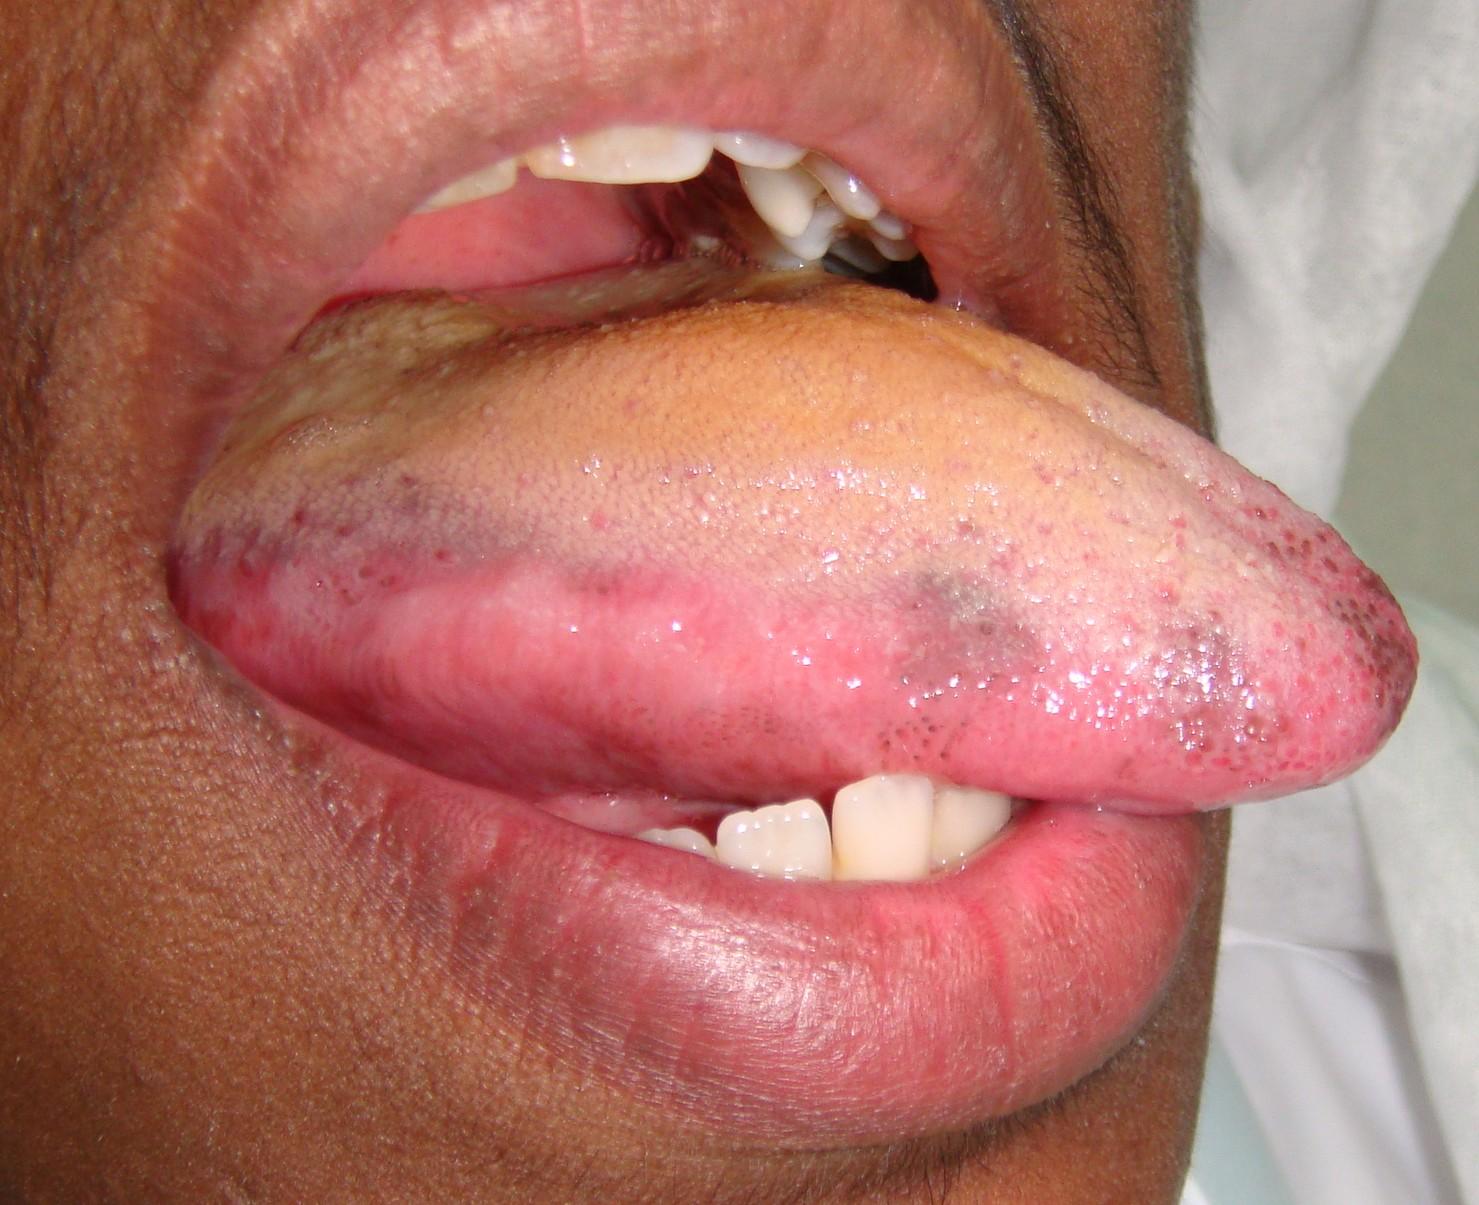 Black Spots On Tongue